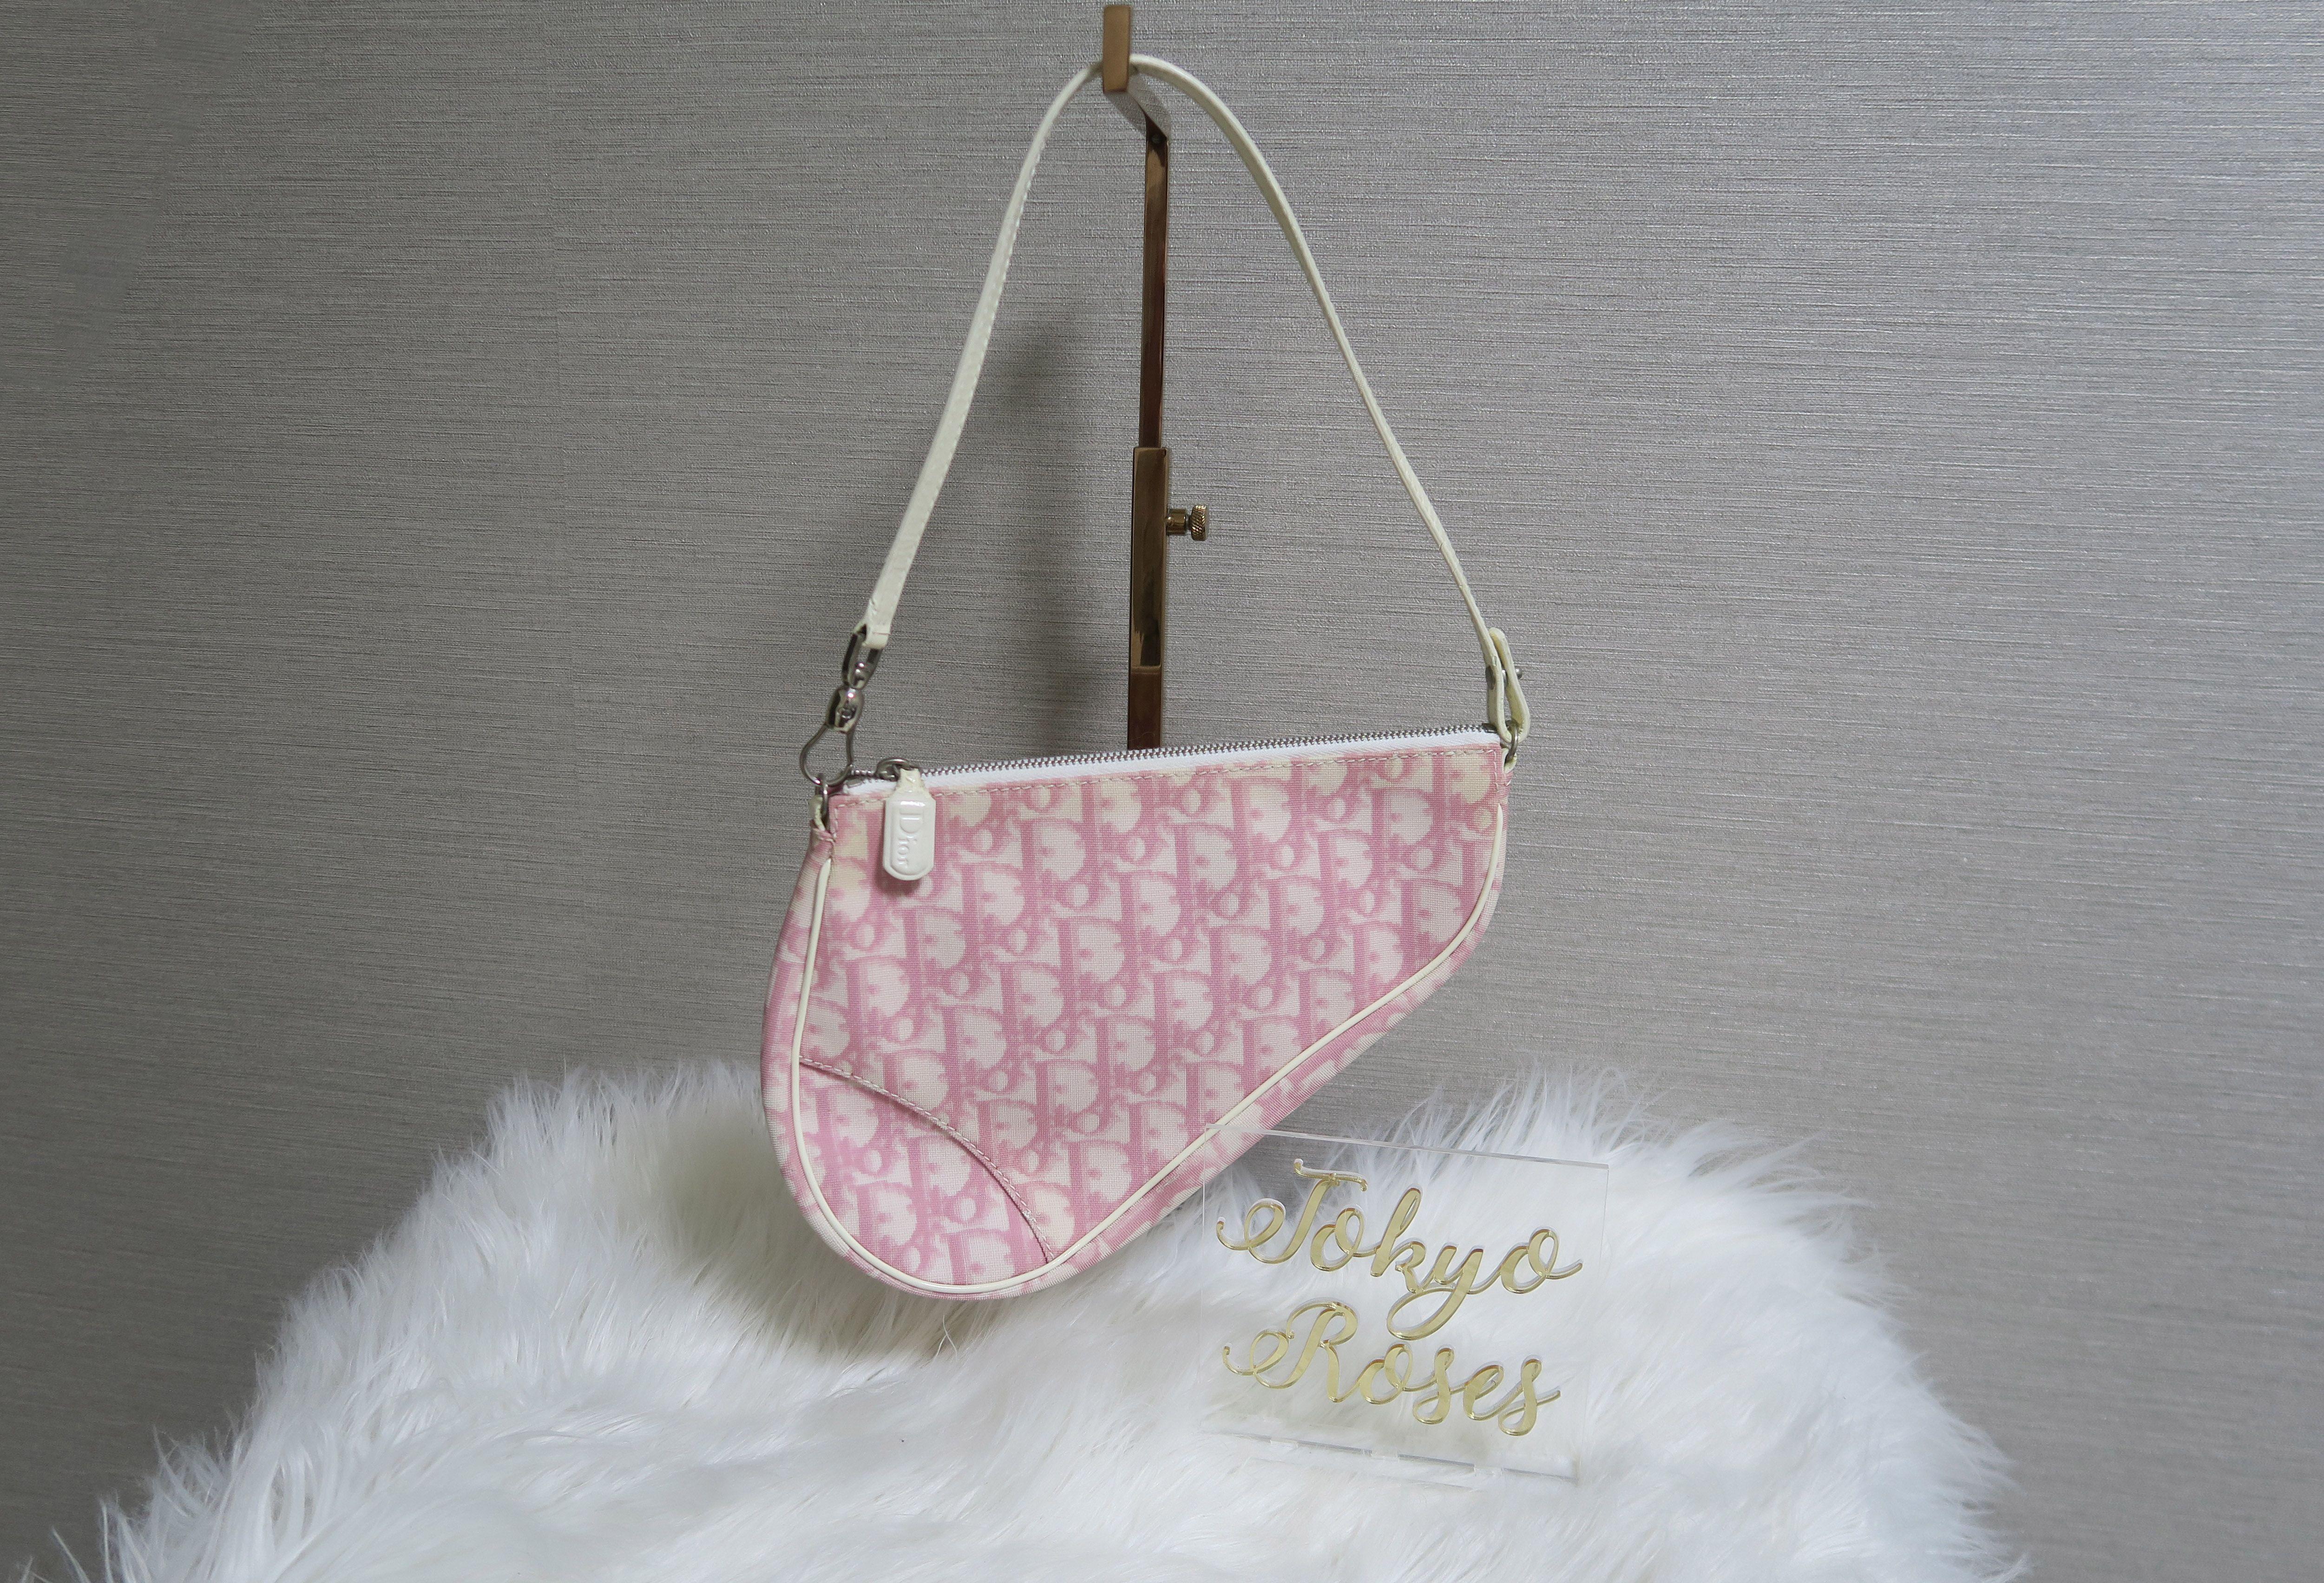 8256455b242 Christian Dior Trotter Monogram Print Saddle Bag Pink & White 204 ...